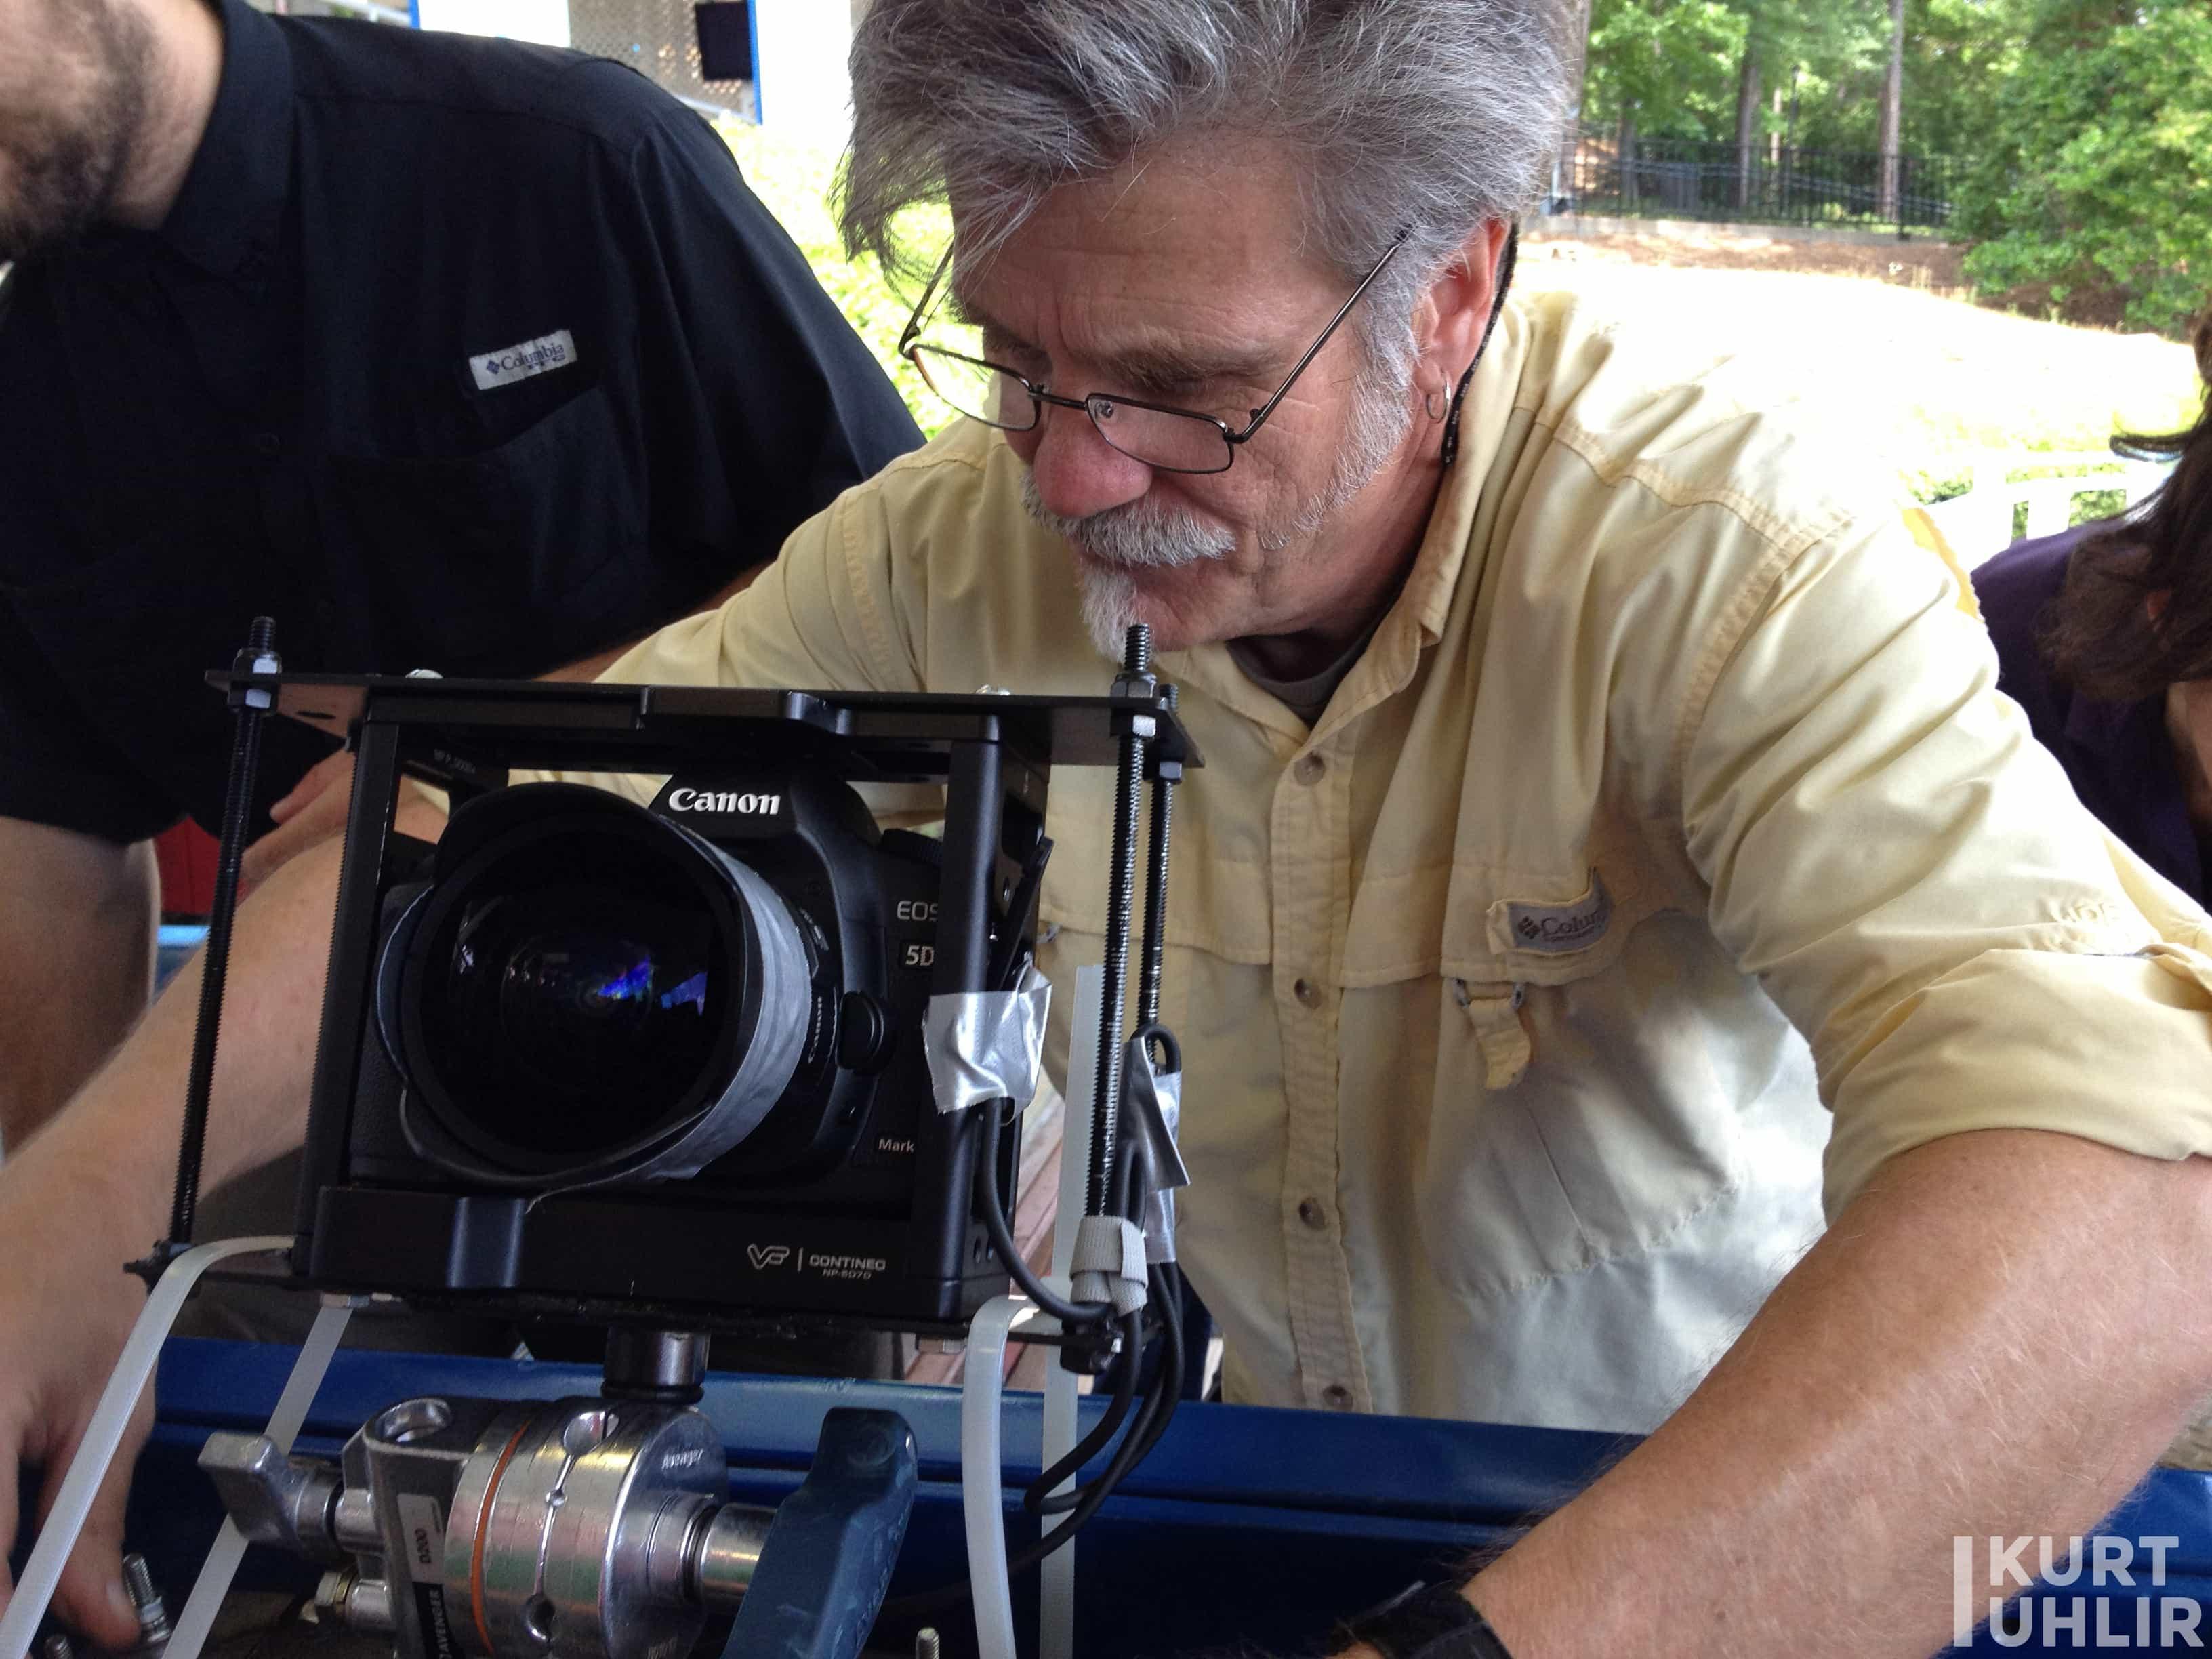 Kurt Uhlir as model for Six Flags over Georgia - behind the scene at photo shoot